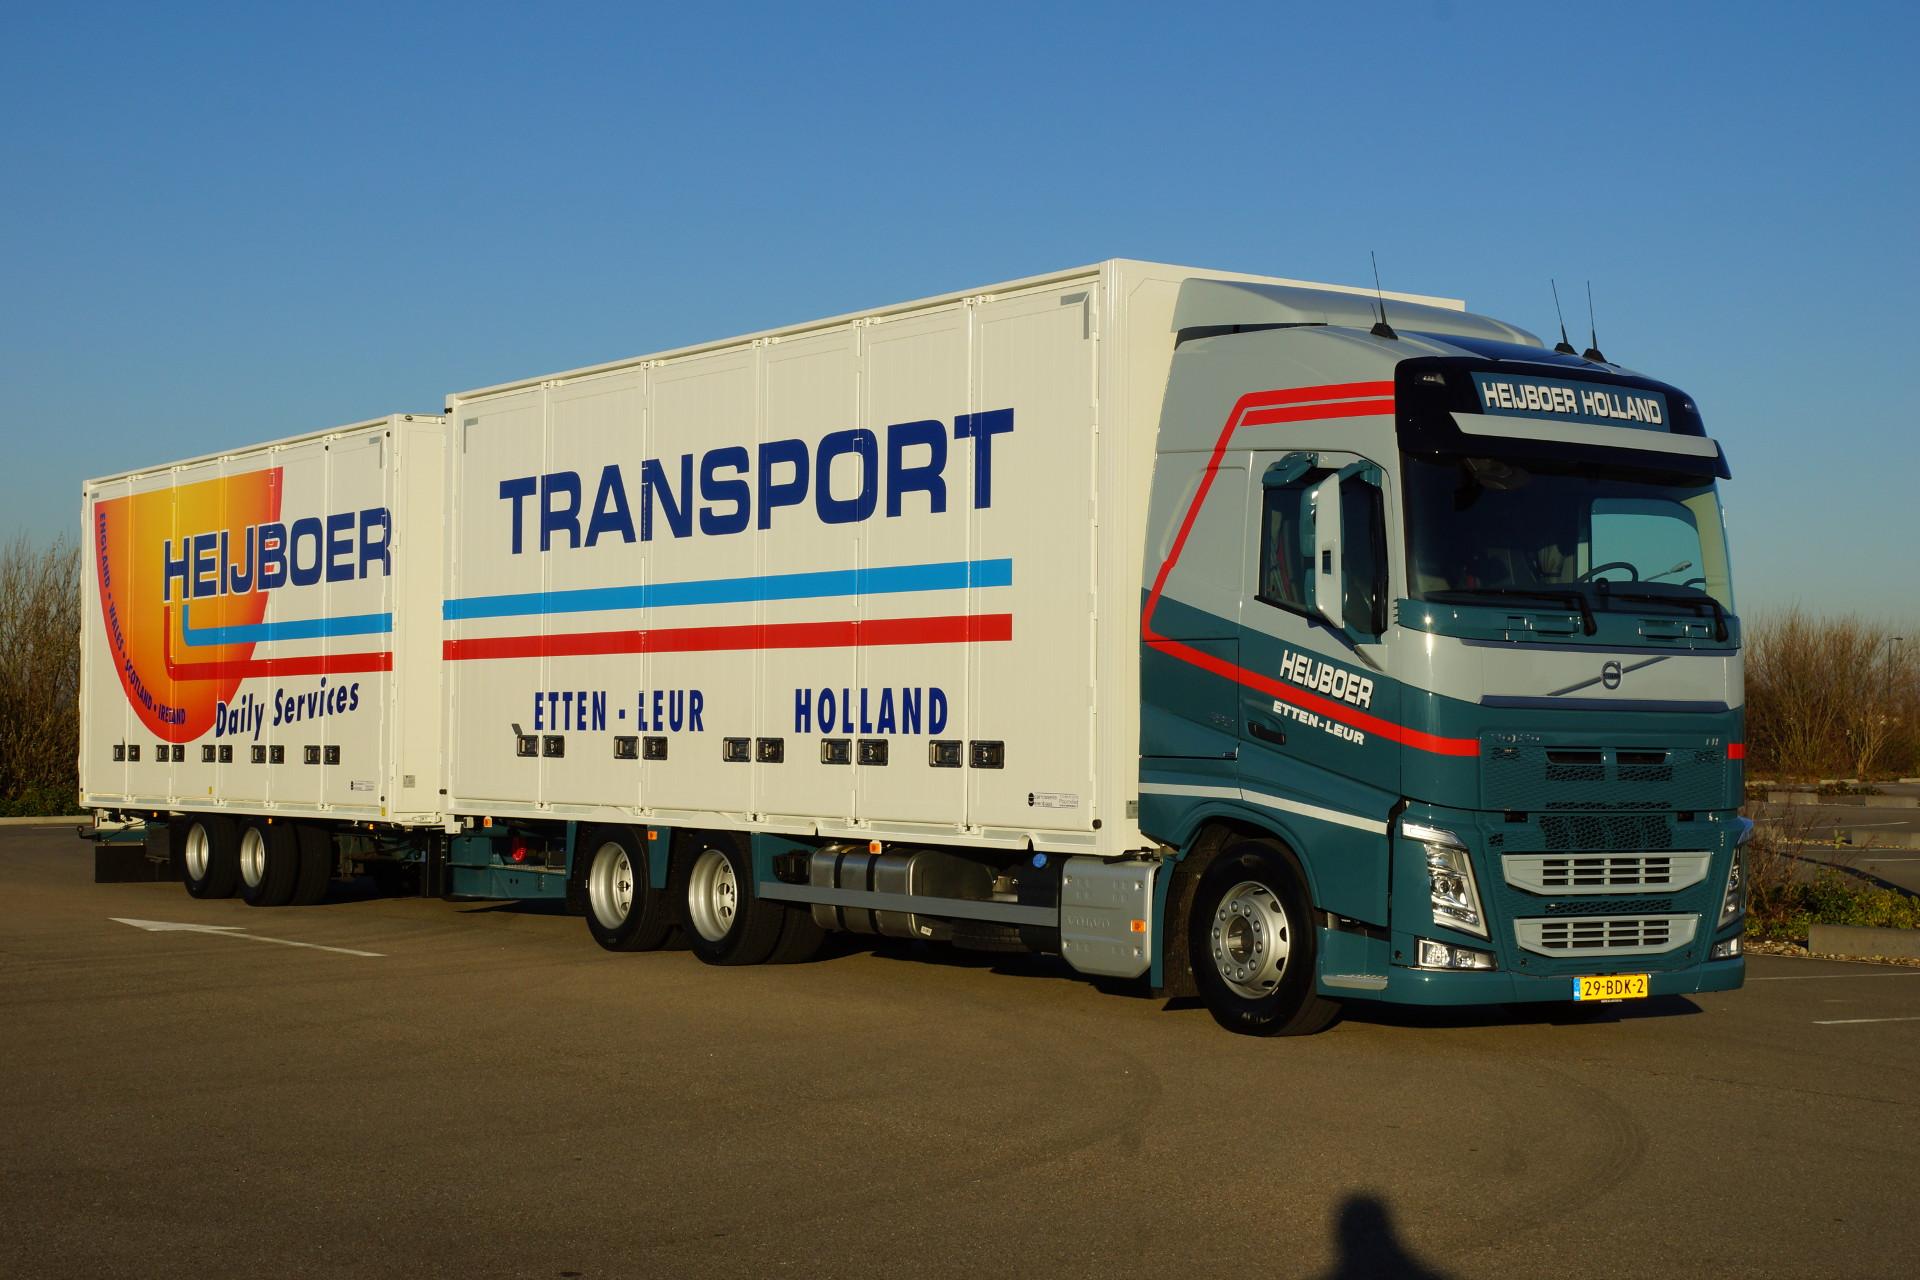 Hijboer-trucks-11